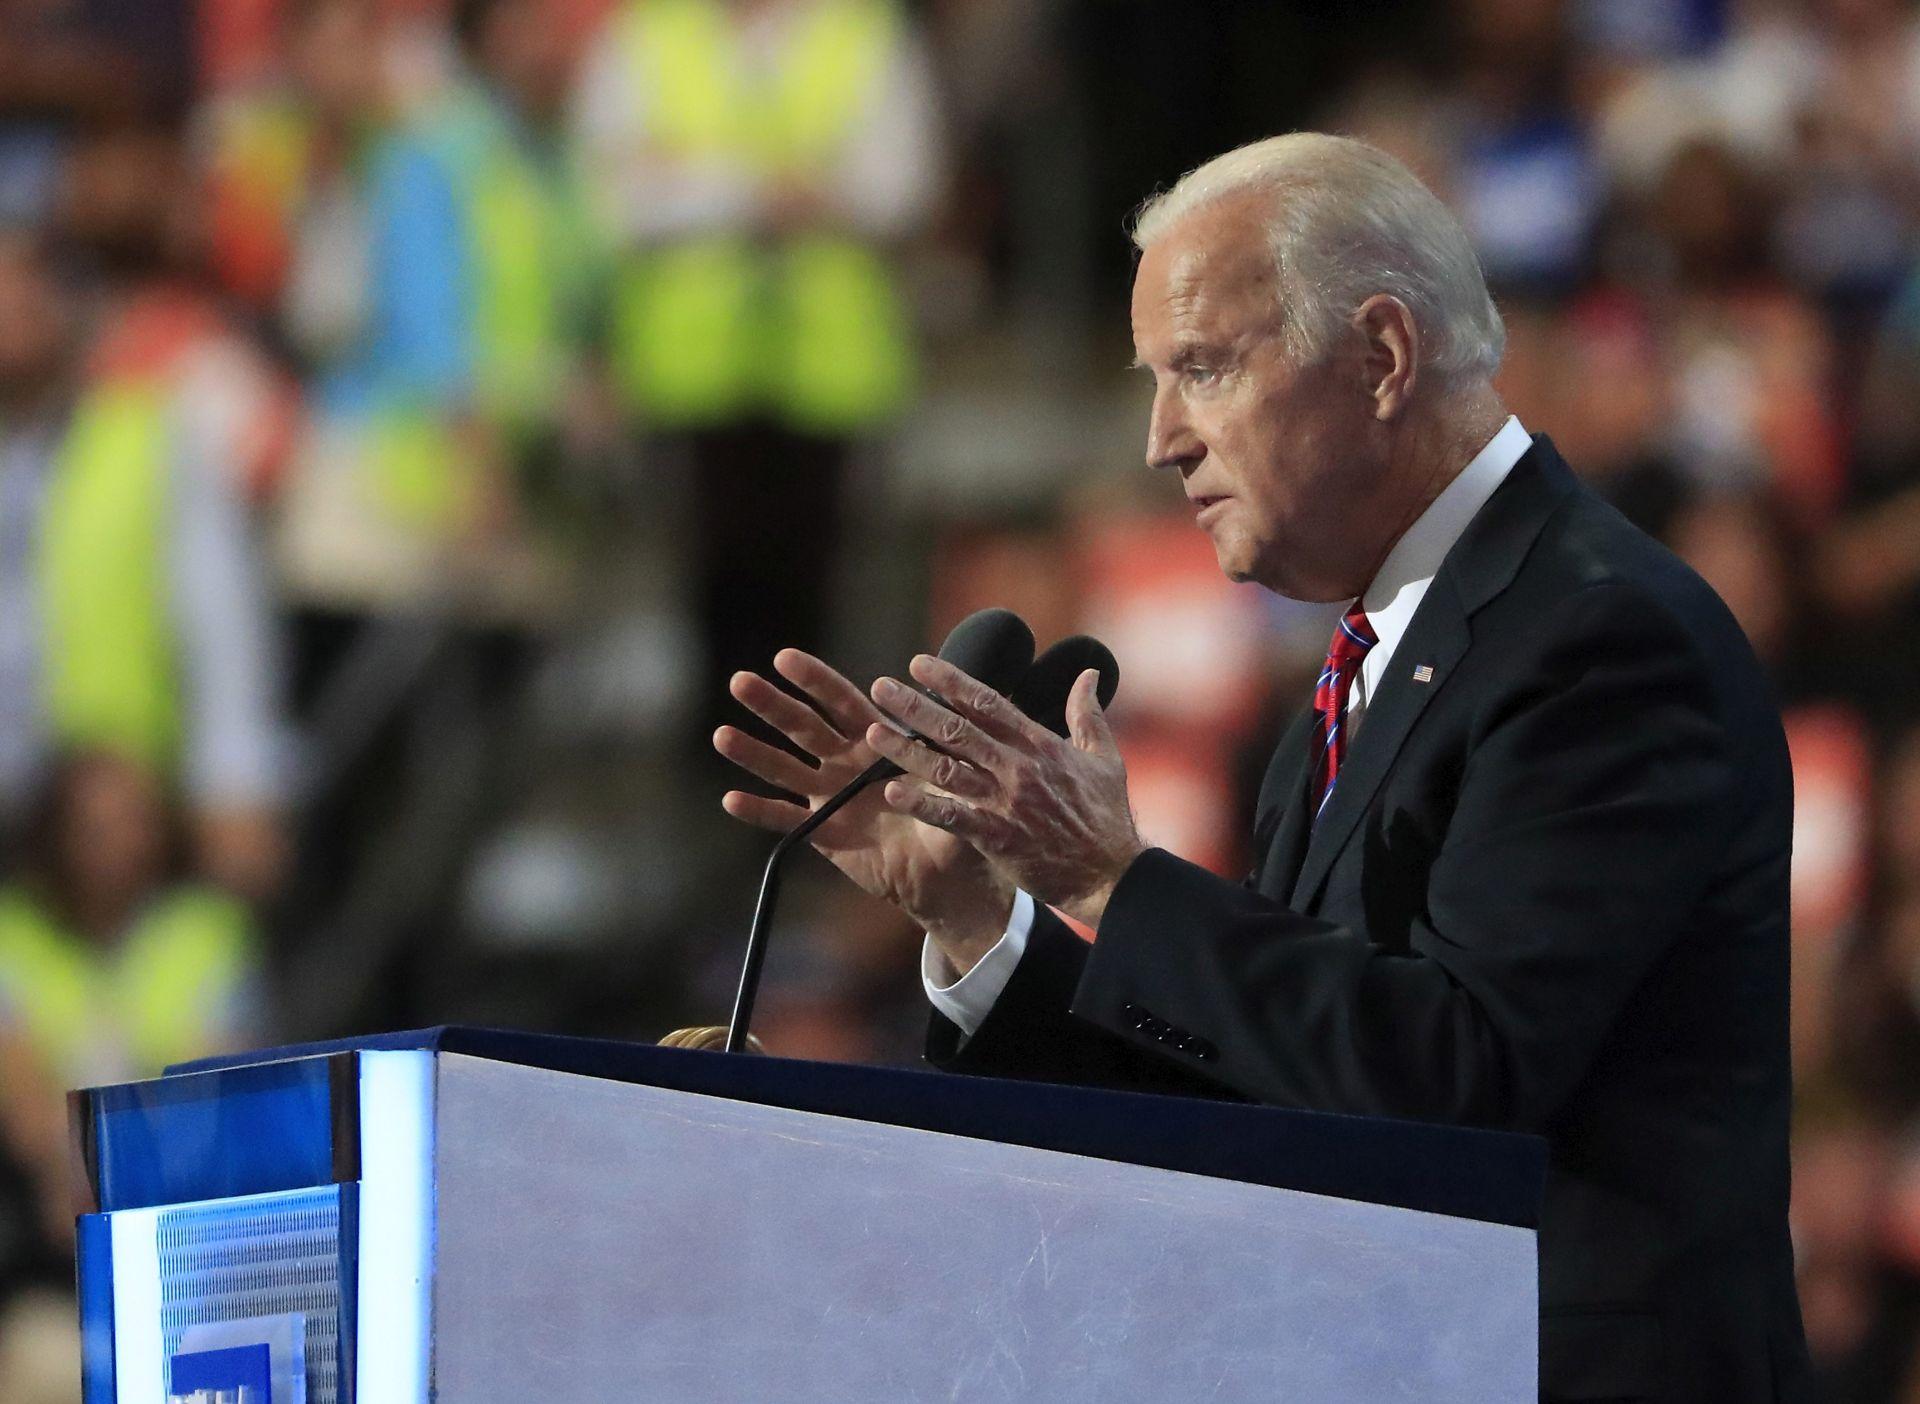 SASTANAK S ERDOGANOM: Joe Biden uskoro u Turskoj